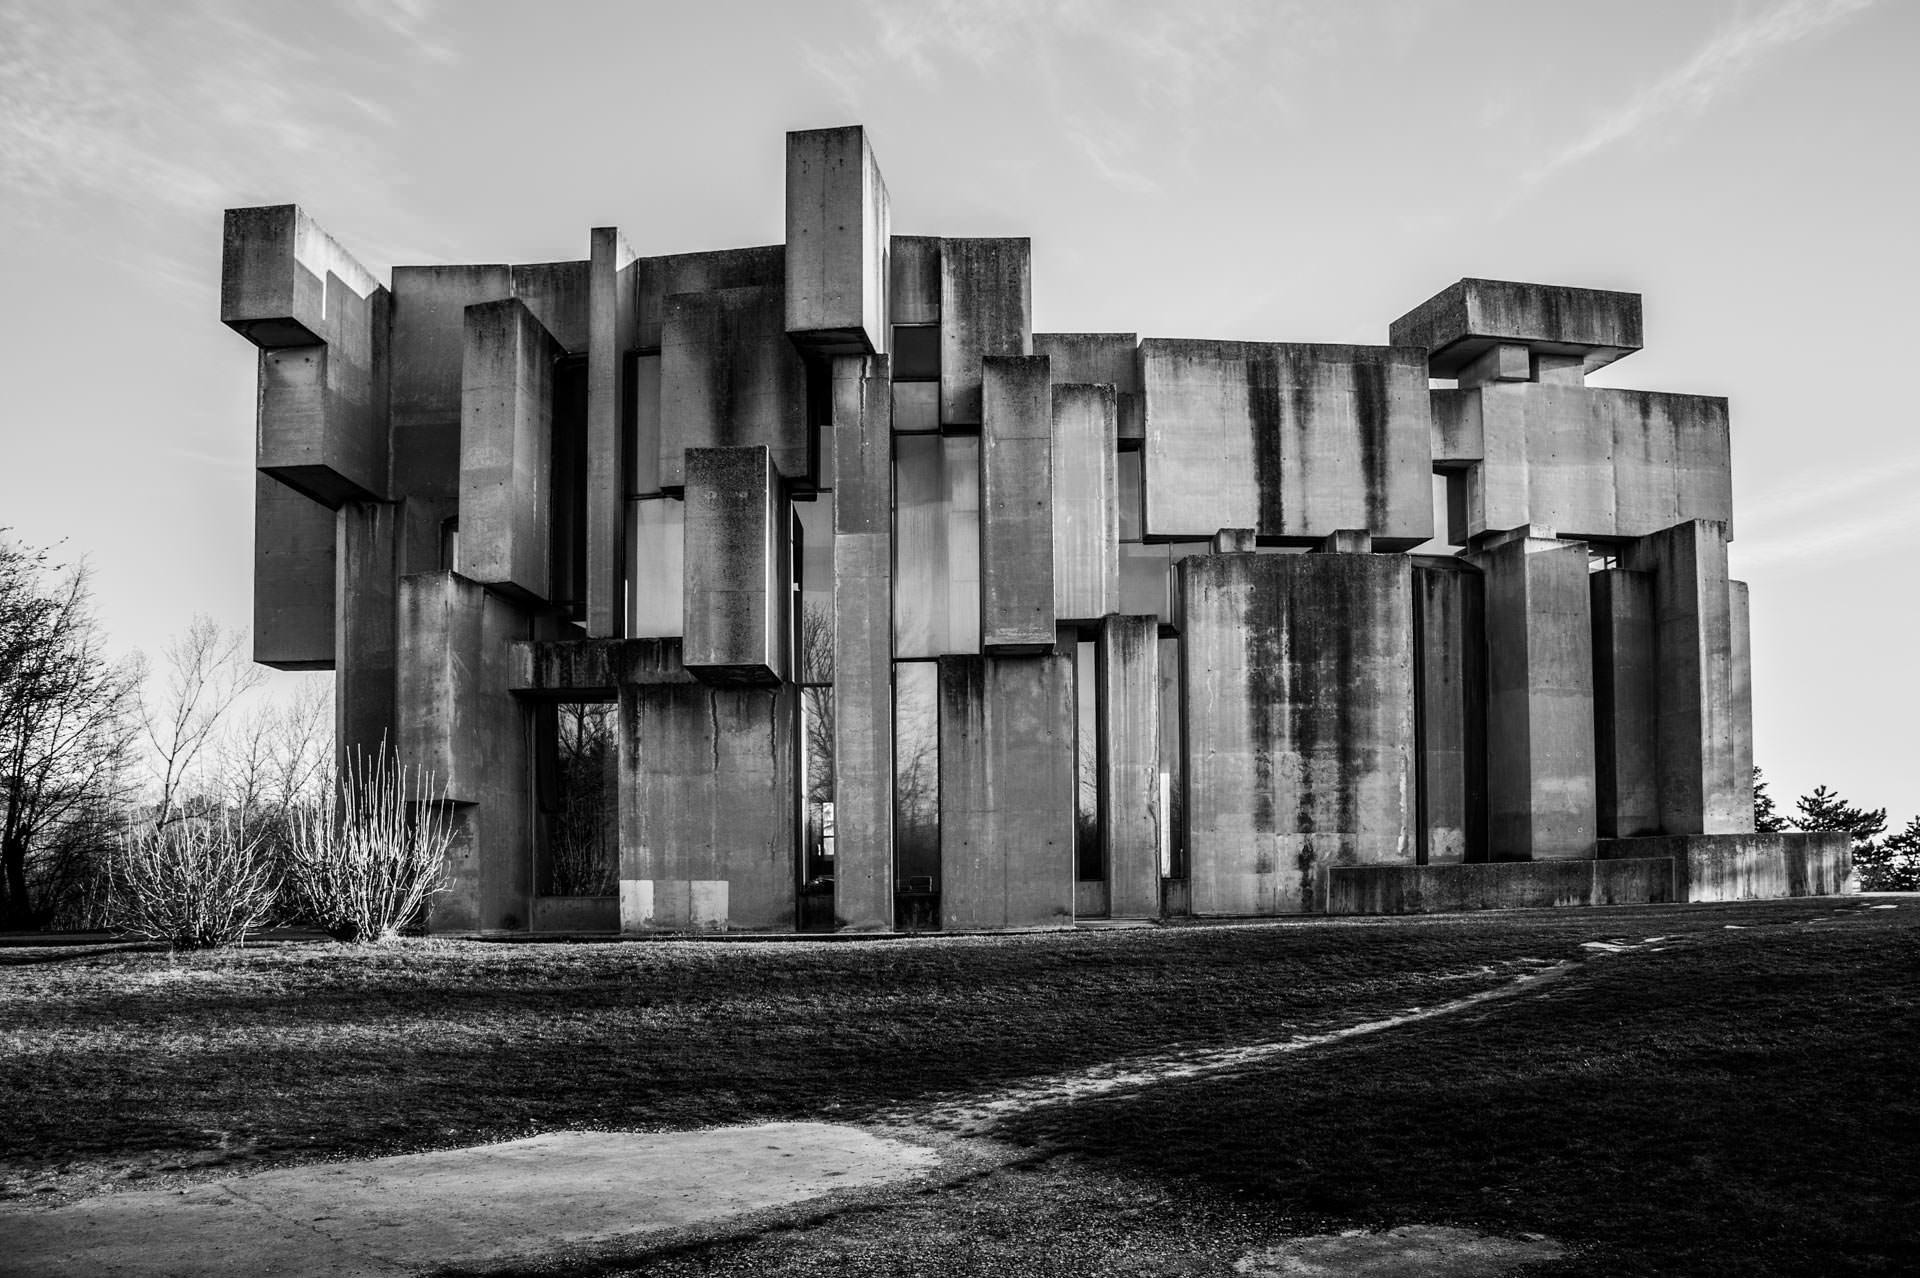 Brasilia Bra Fd B as well Cathedral of brasília besides Museum Of Contemporary Art Brazil likewise Dia Do Arquiteto Oscar Niemeyer additionally 10840277. on oscar niemeyer concrete